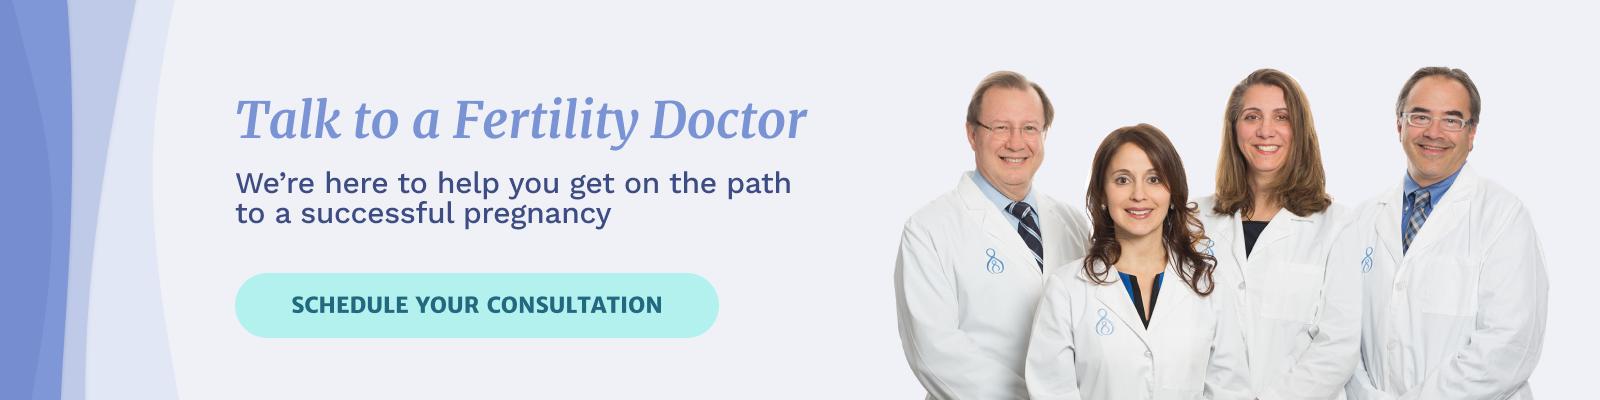 Talk to a fertility doctor